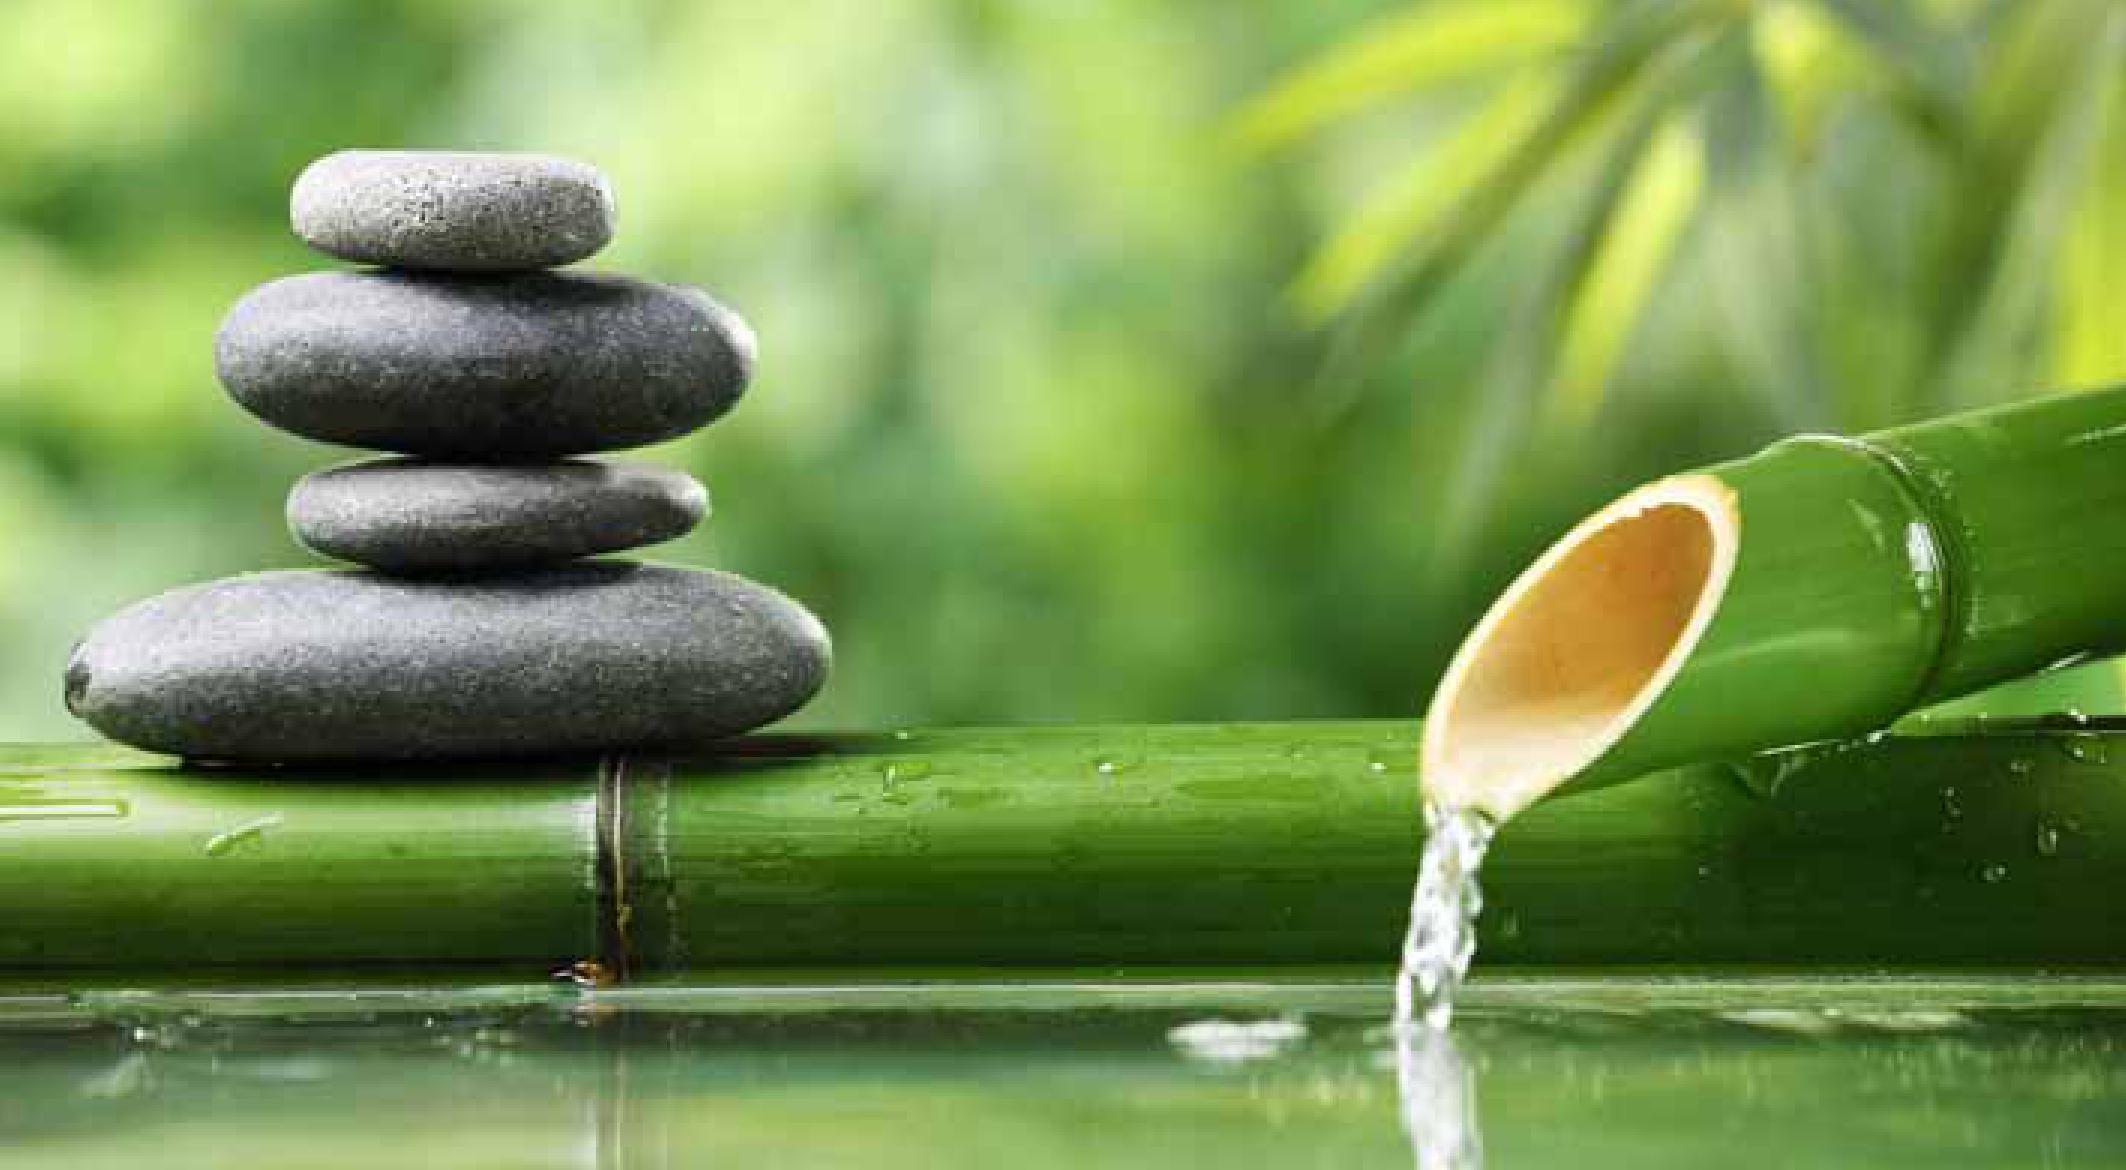 vista di pietra e bambù con aqua